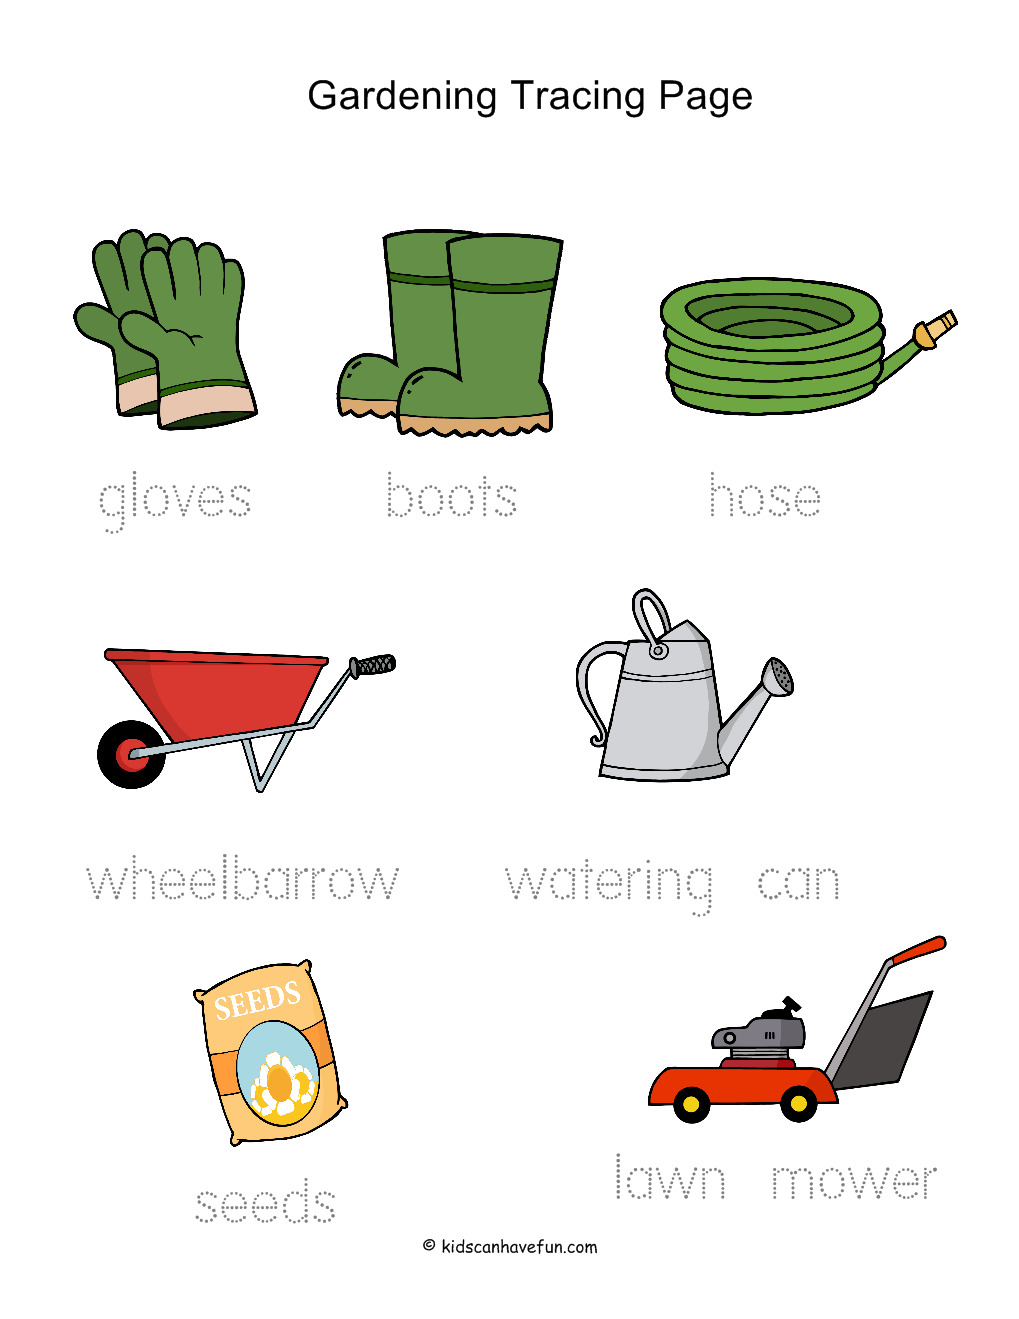 gardening tracing worksheet gardening pinterest worksheets activities and homeschool. Black Bedroom Furniture Sets. Home Design Ideas